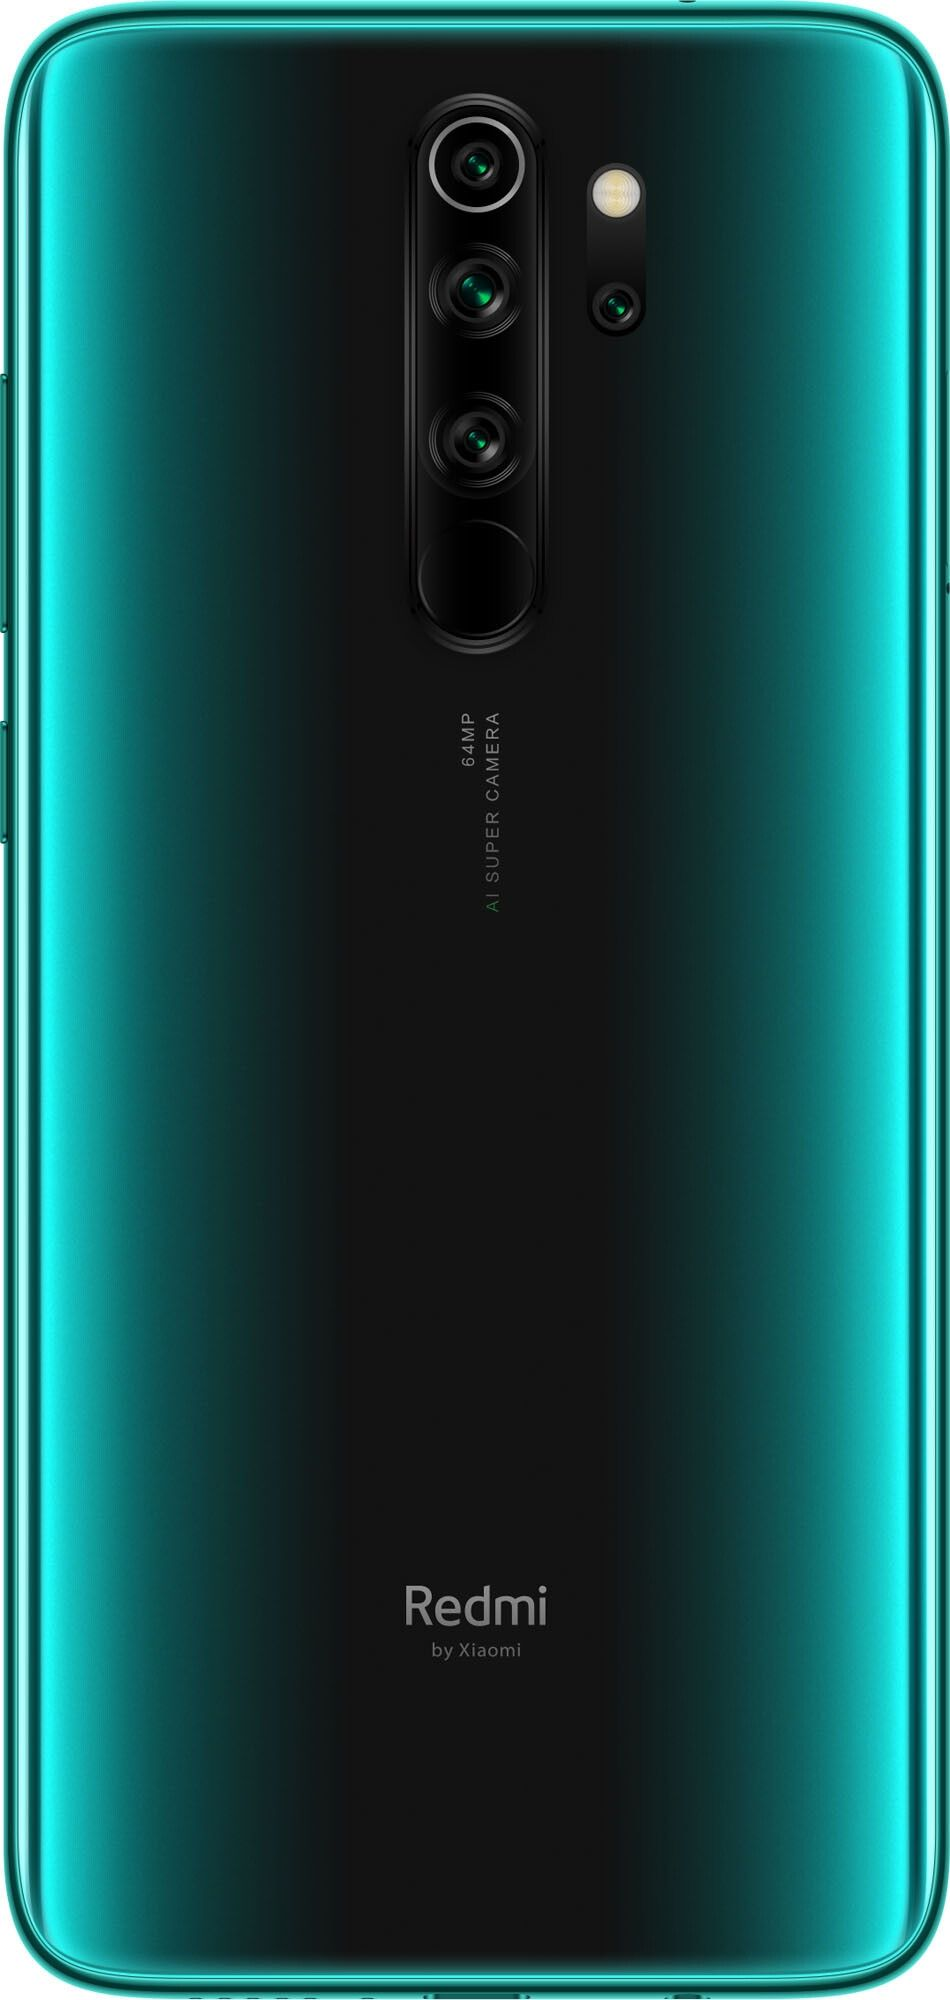 Смартфон Xiaomi Redmi Note 8 Pro 6/128GB Green от Територія твоєї техніки - 7